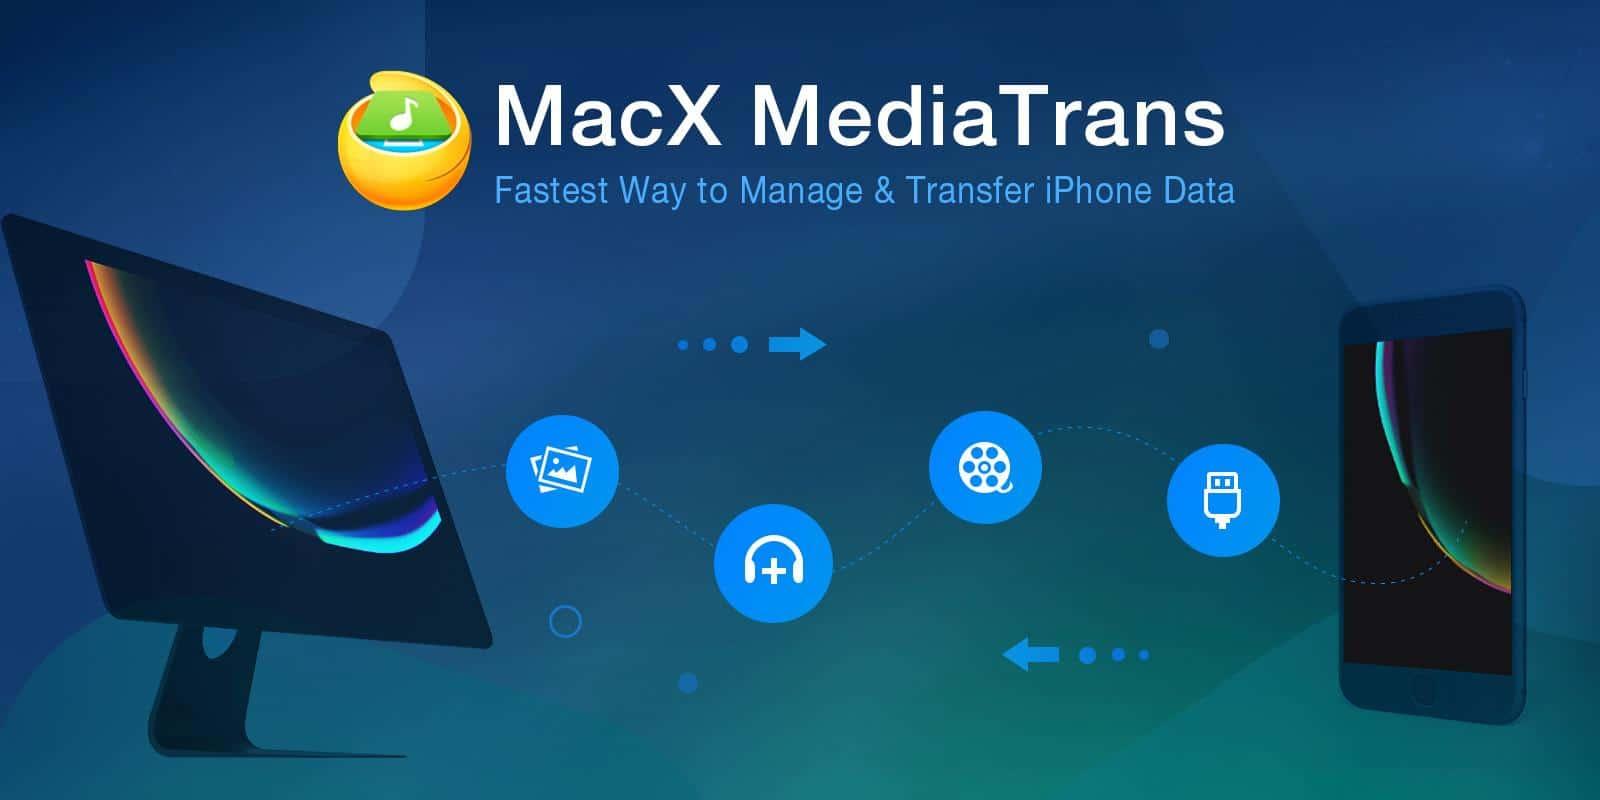 macx media transfer macx mediatrans